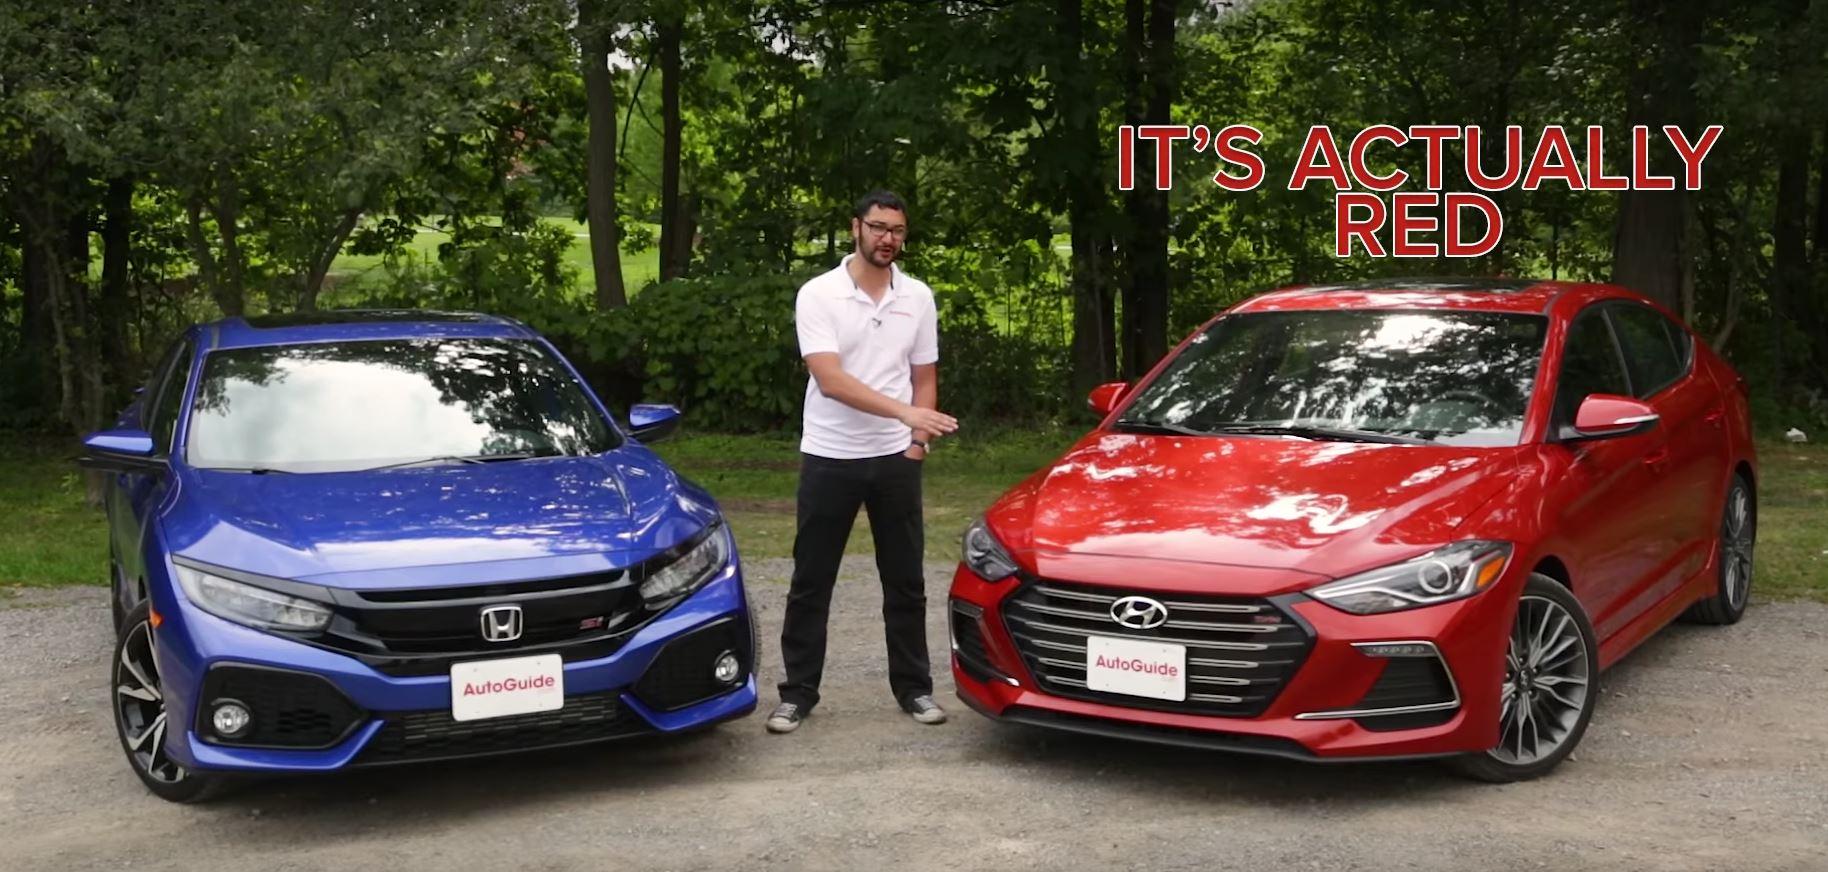 2018 Honda Civic Si Vs Hyundai Elantra Sport Which Is The Best